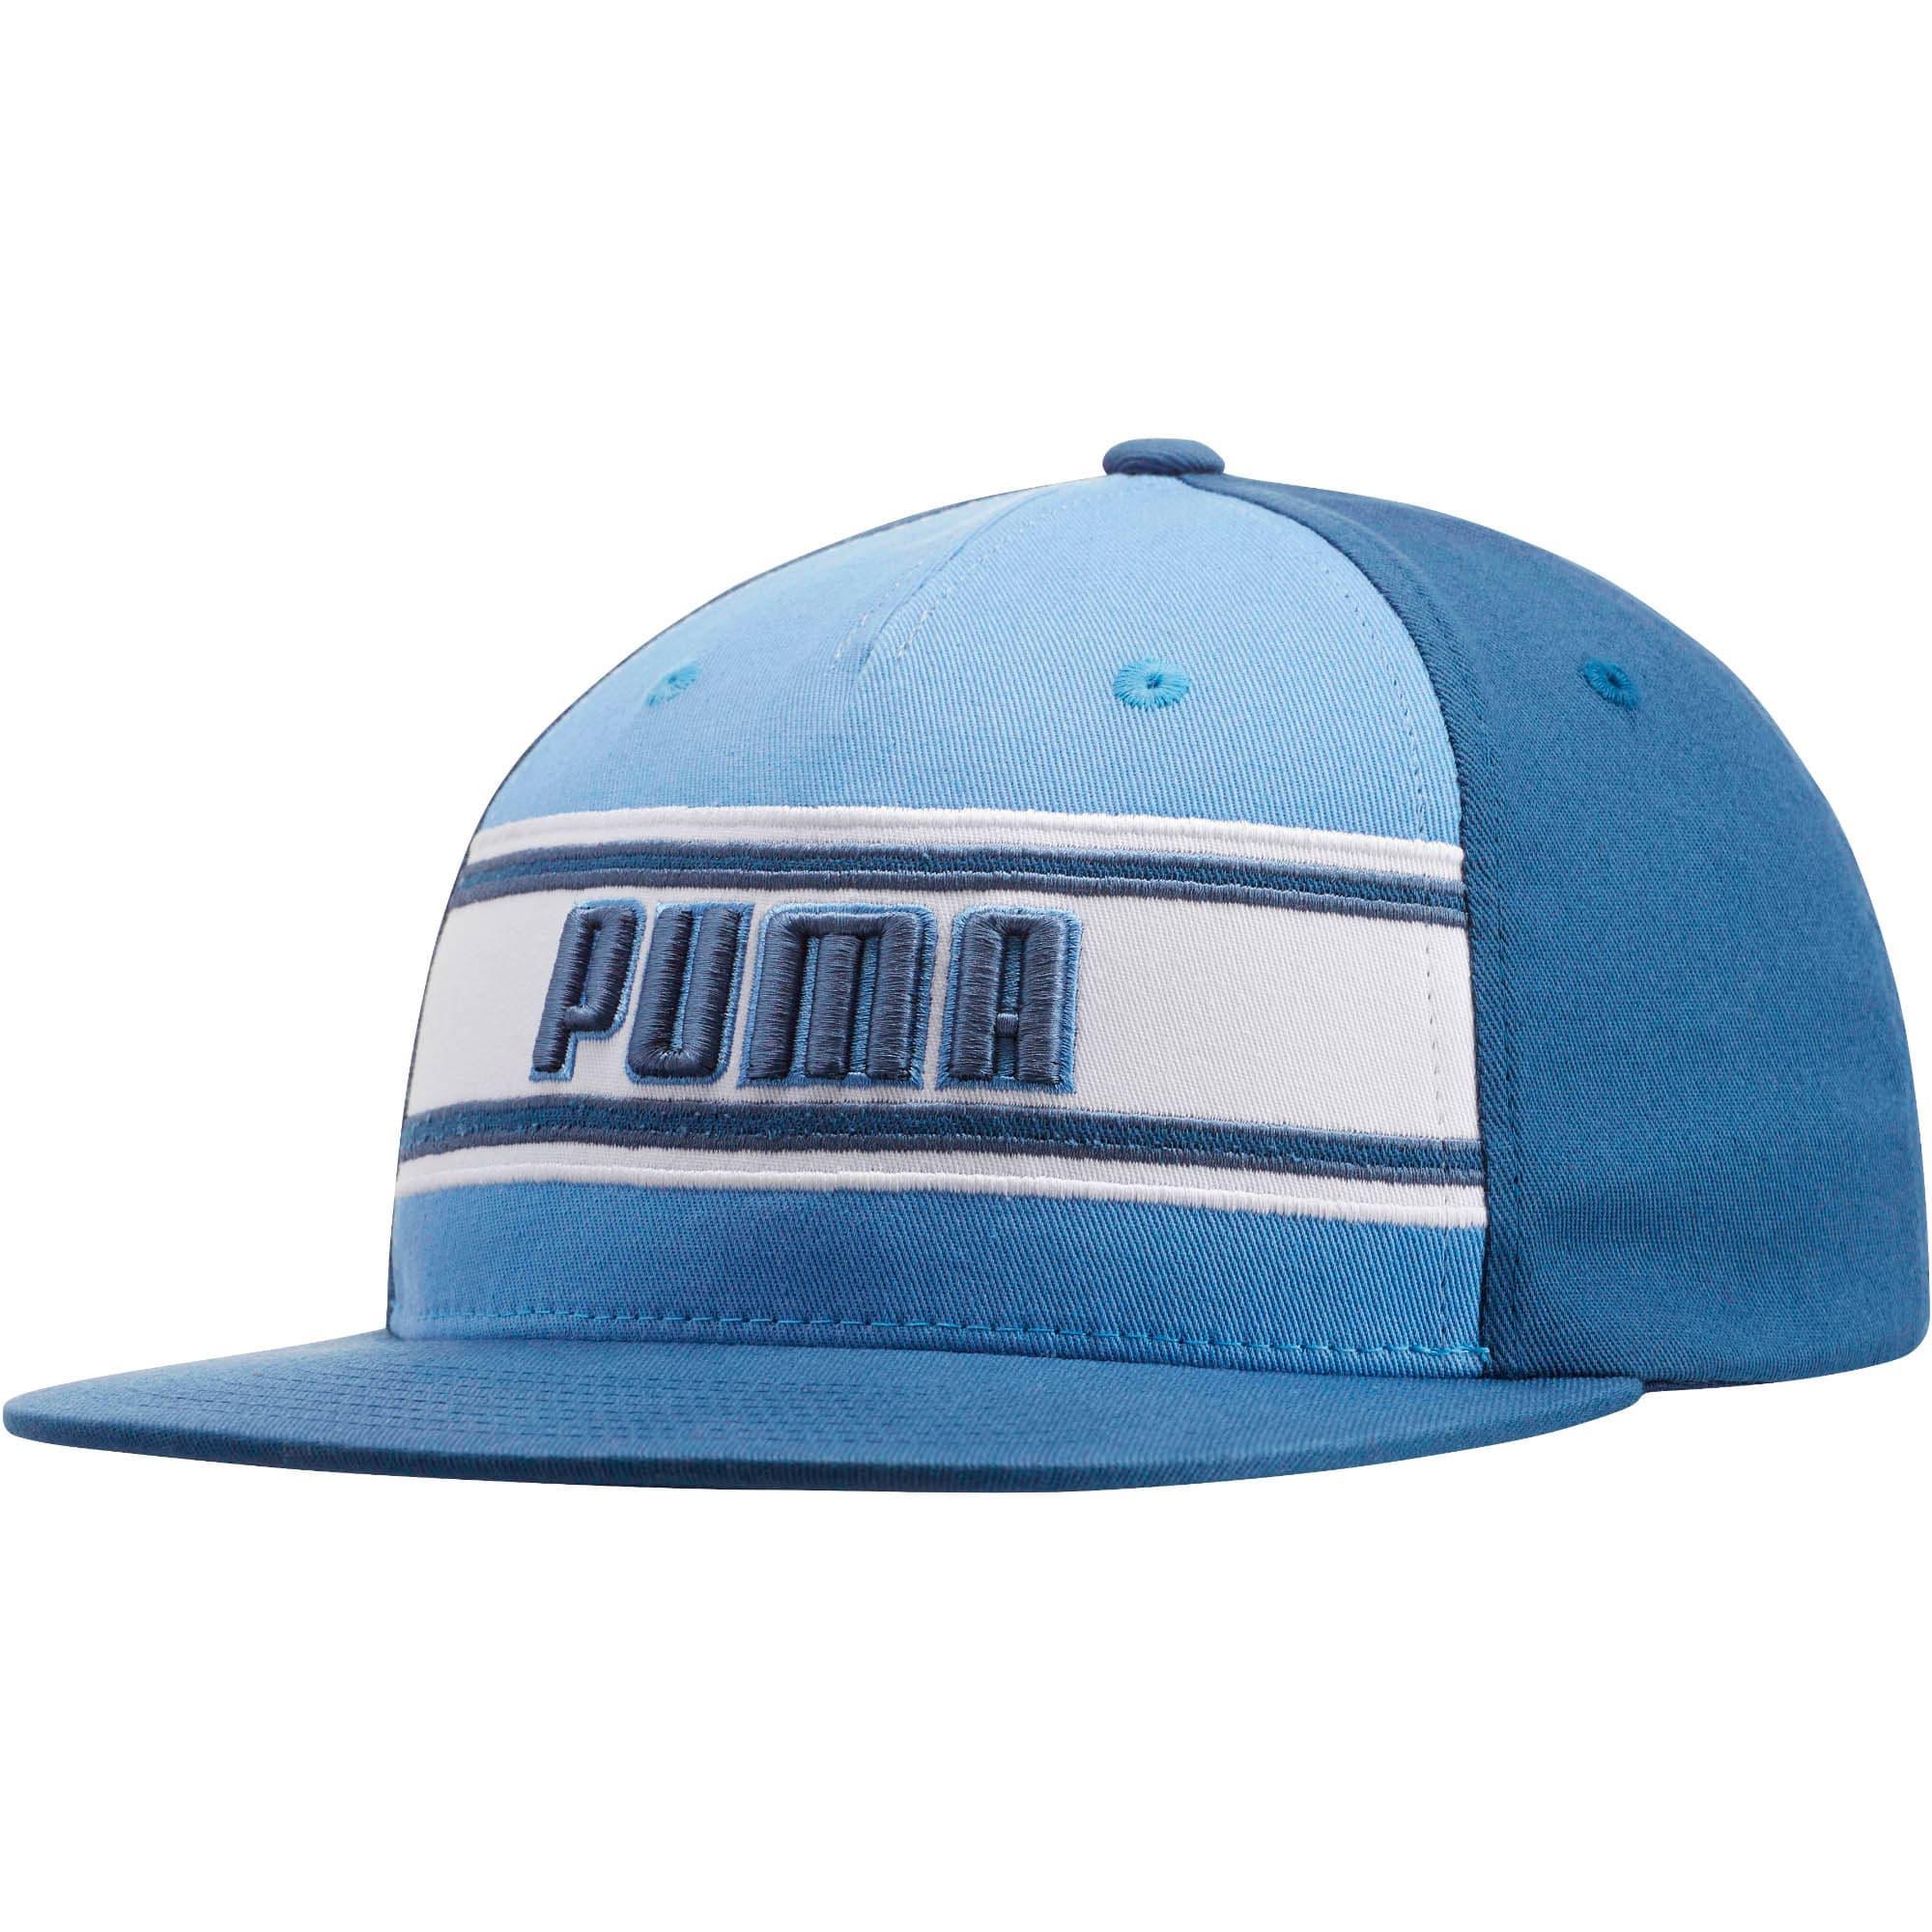 Thumbnail 1 of STAGE DIVE FLATBILL FLEXFIT Hat, BLUE, medium